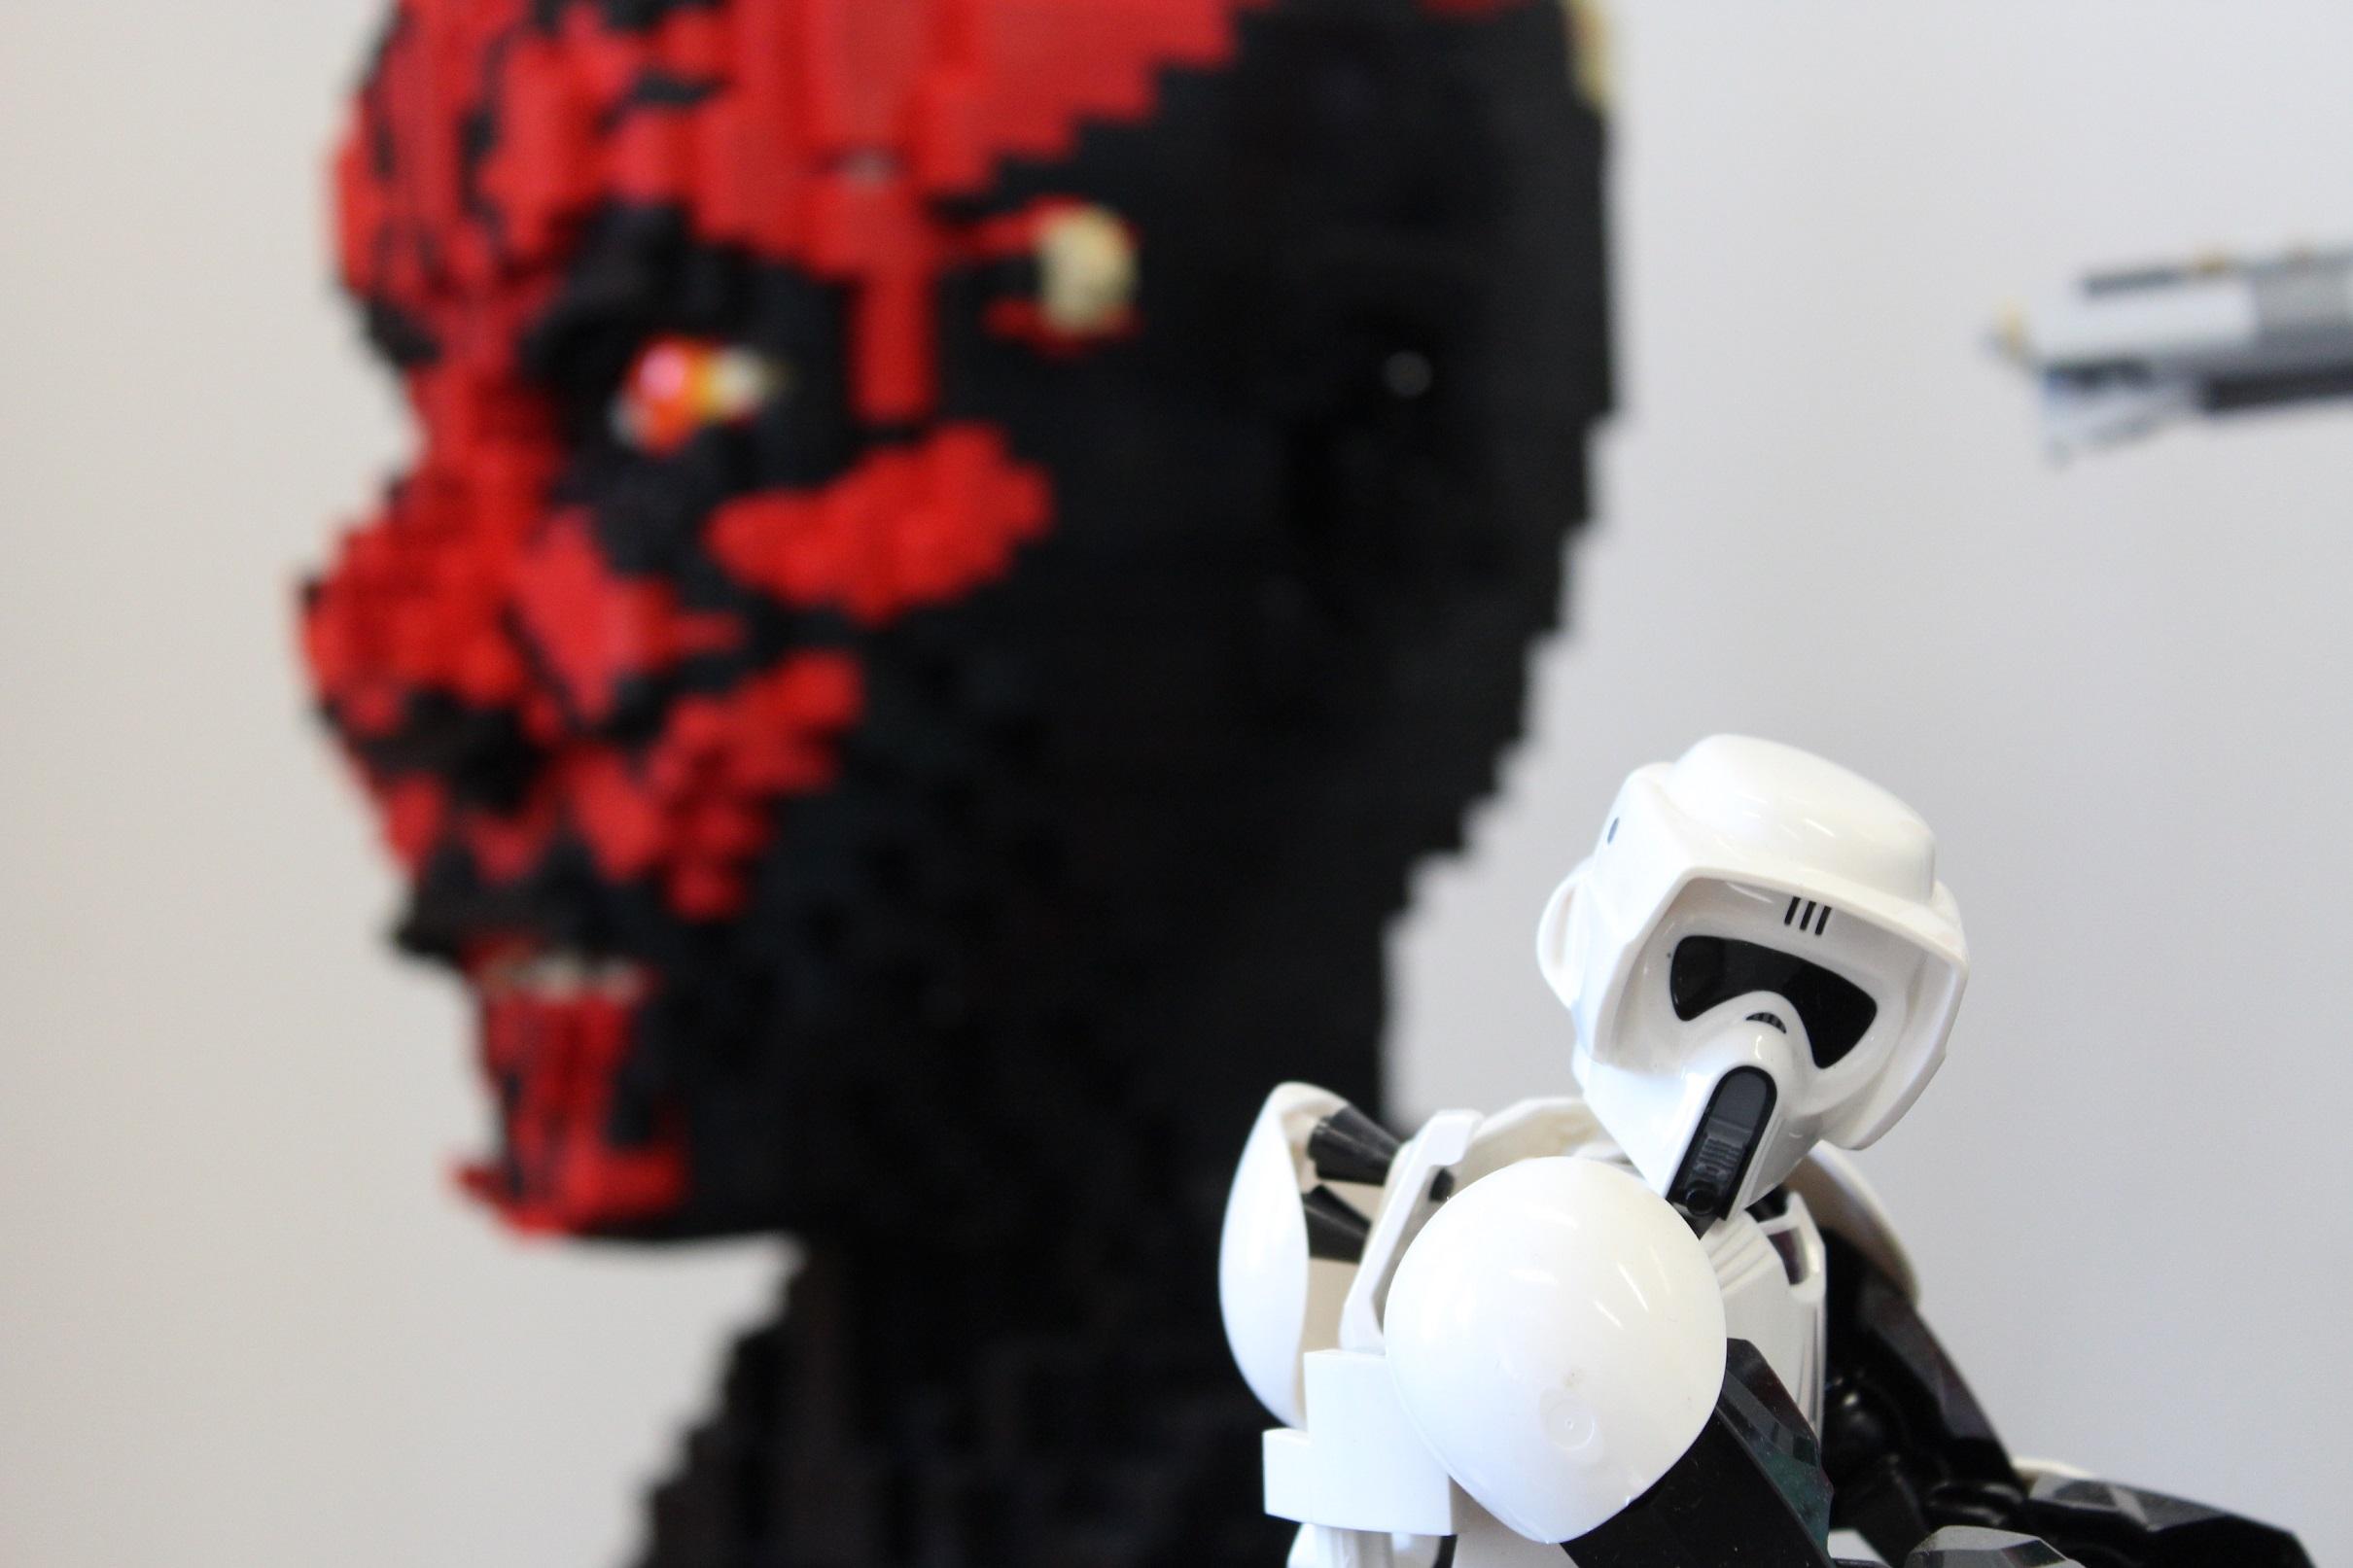 szmk_lego_star_wars_kockanapok_marvel_bosszuallok_17.JPG